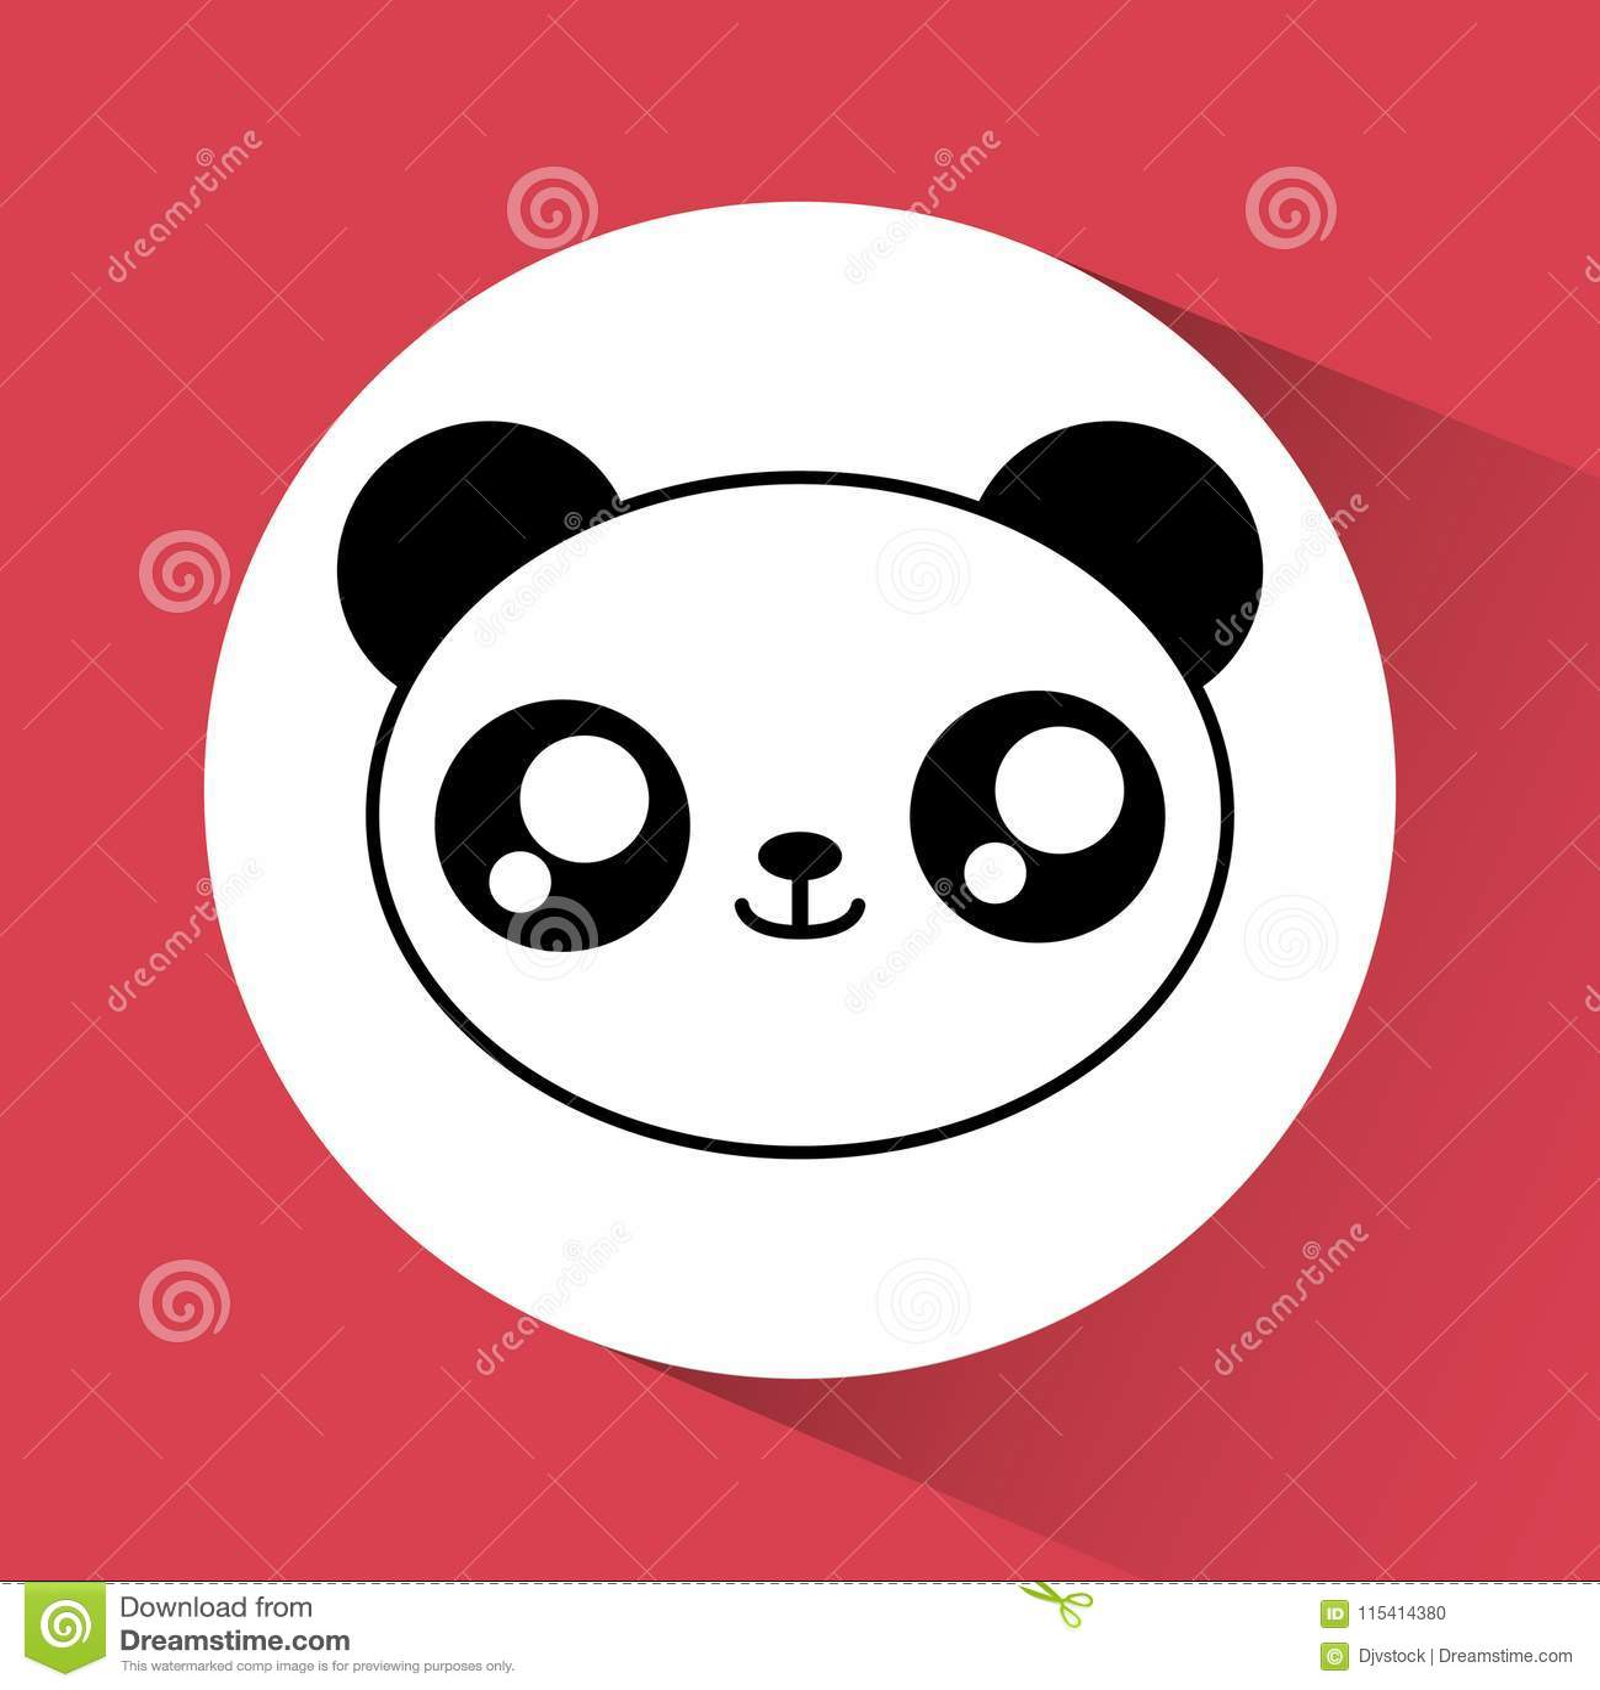 Icone De Panda De Kawaii Animal Mignon Dessin De Vecteur